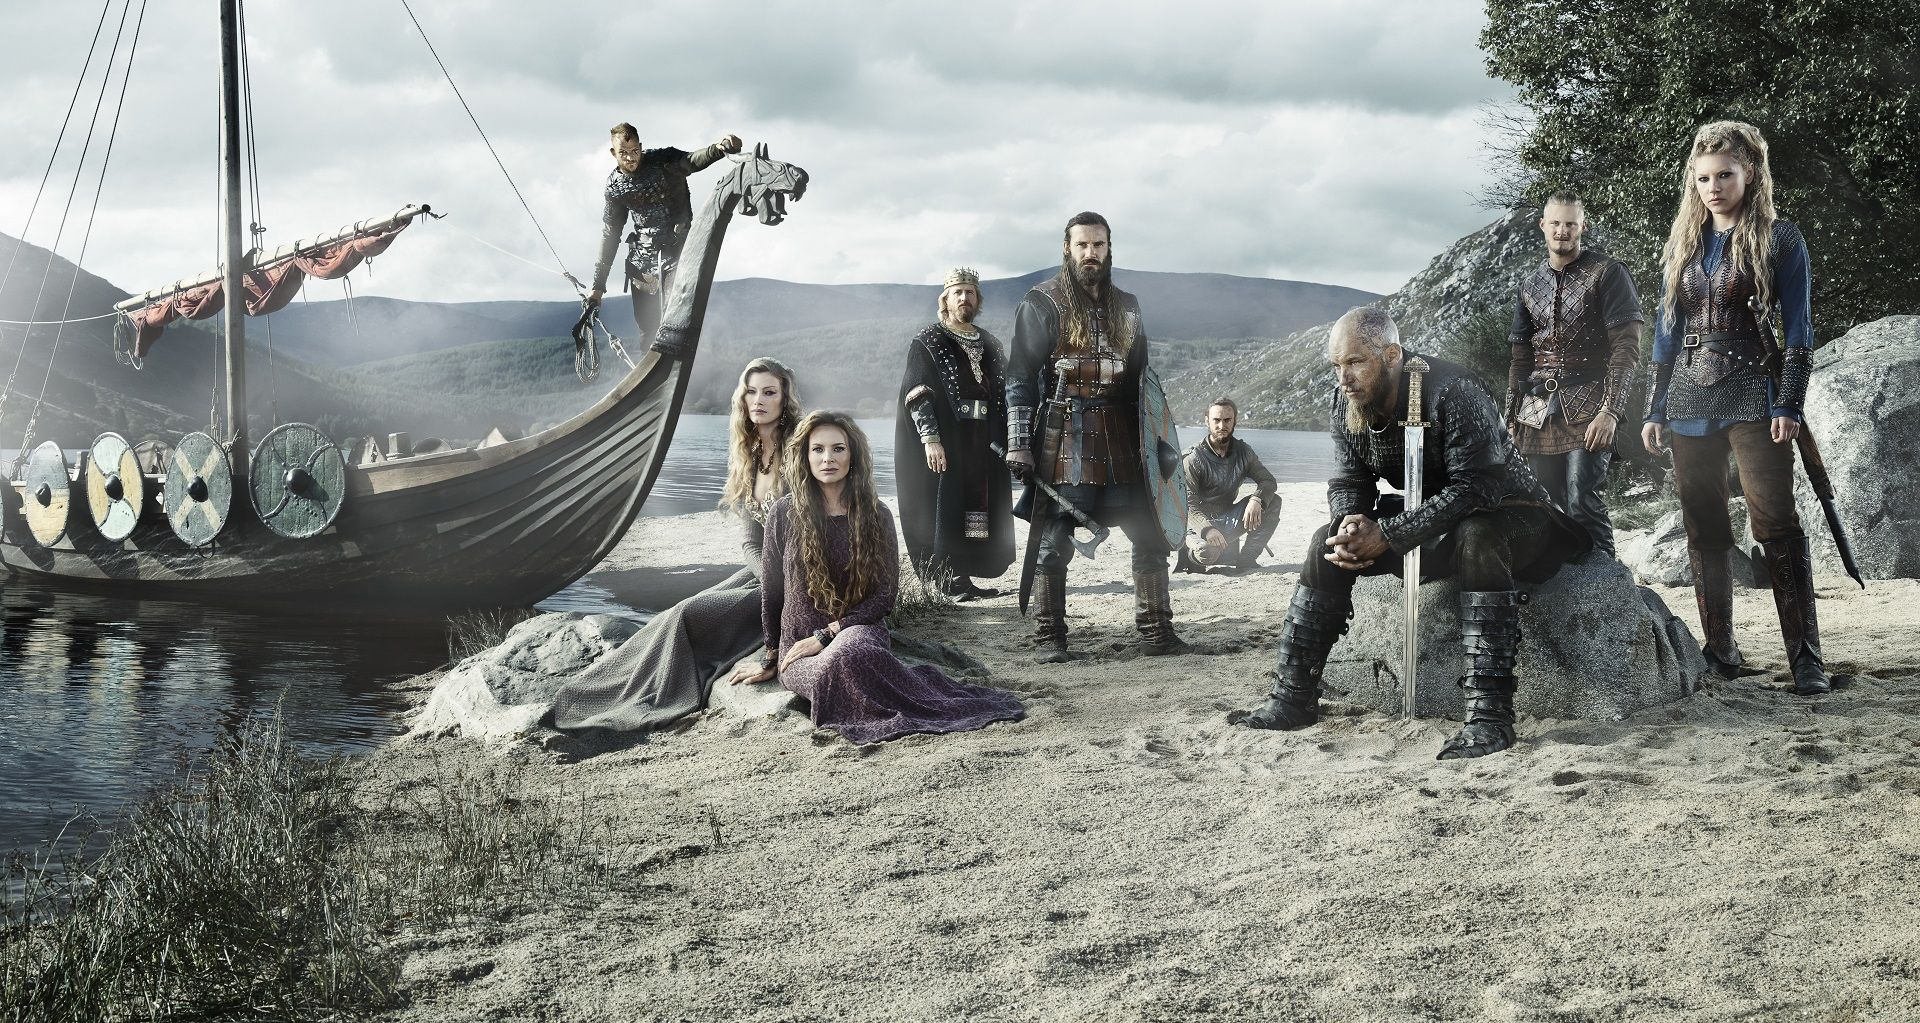 Fondos De Vikingos Wallpapers De La Serie Vikingos En Hd Series En 2019 Vikingos Actores